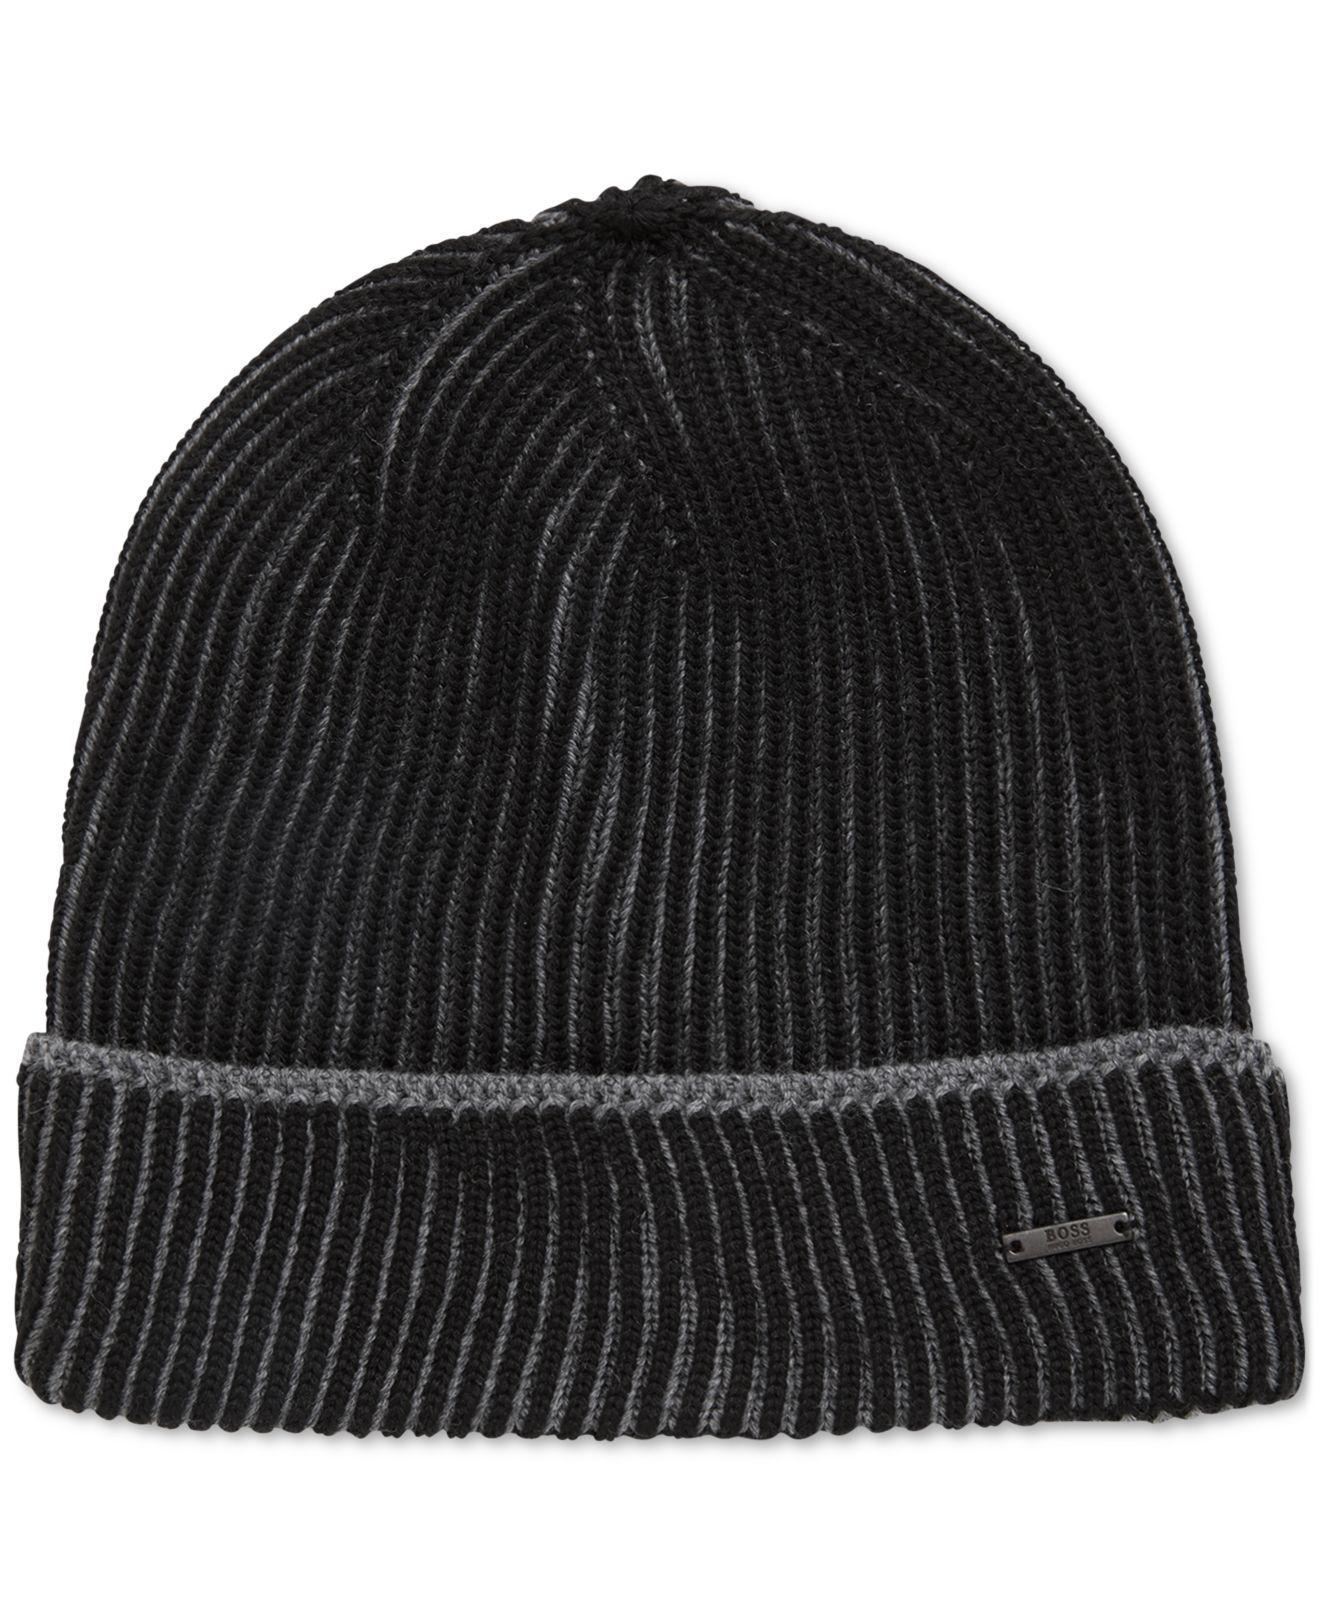 6623773035eff BOSS - Black Knitted Virgin Wool Beanie Hat for Men - Lyst. View fullscreen